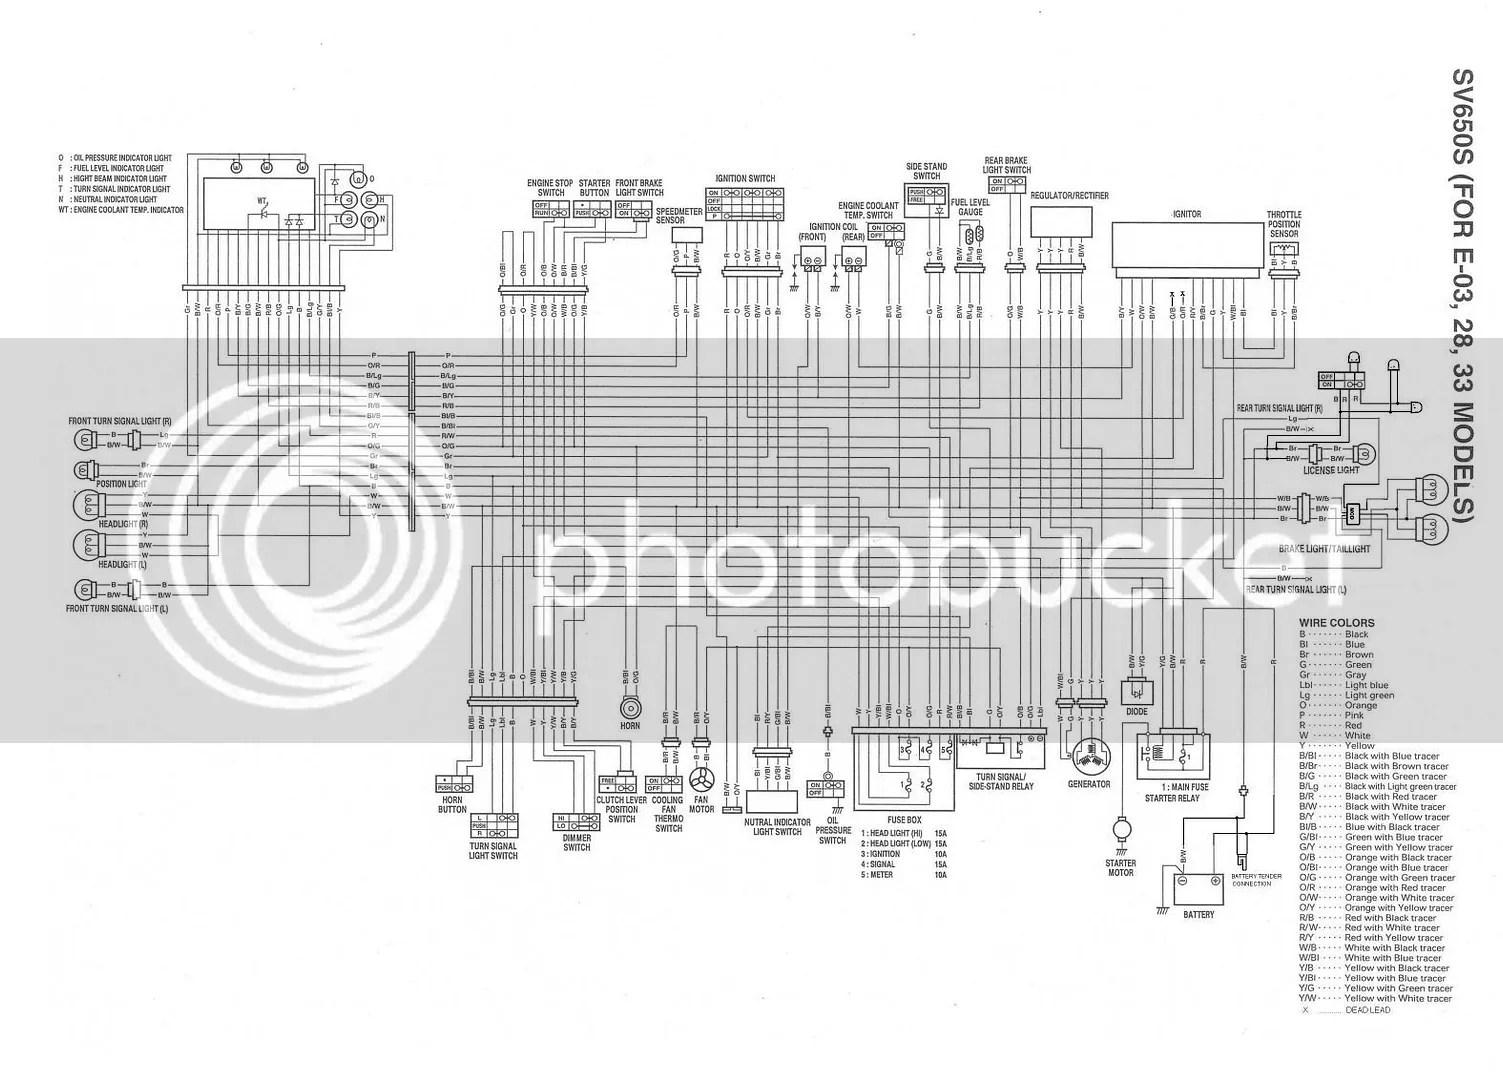 hight resolution of sv 650 key wiring diagram wiring diagram expertsv 650 key wiring diagram wiring diagram sch sv